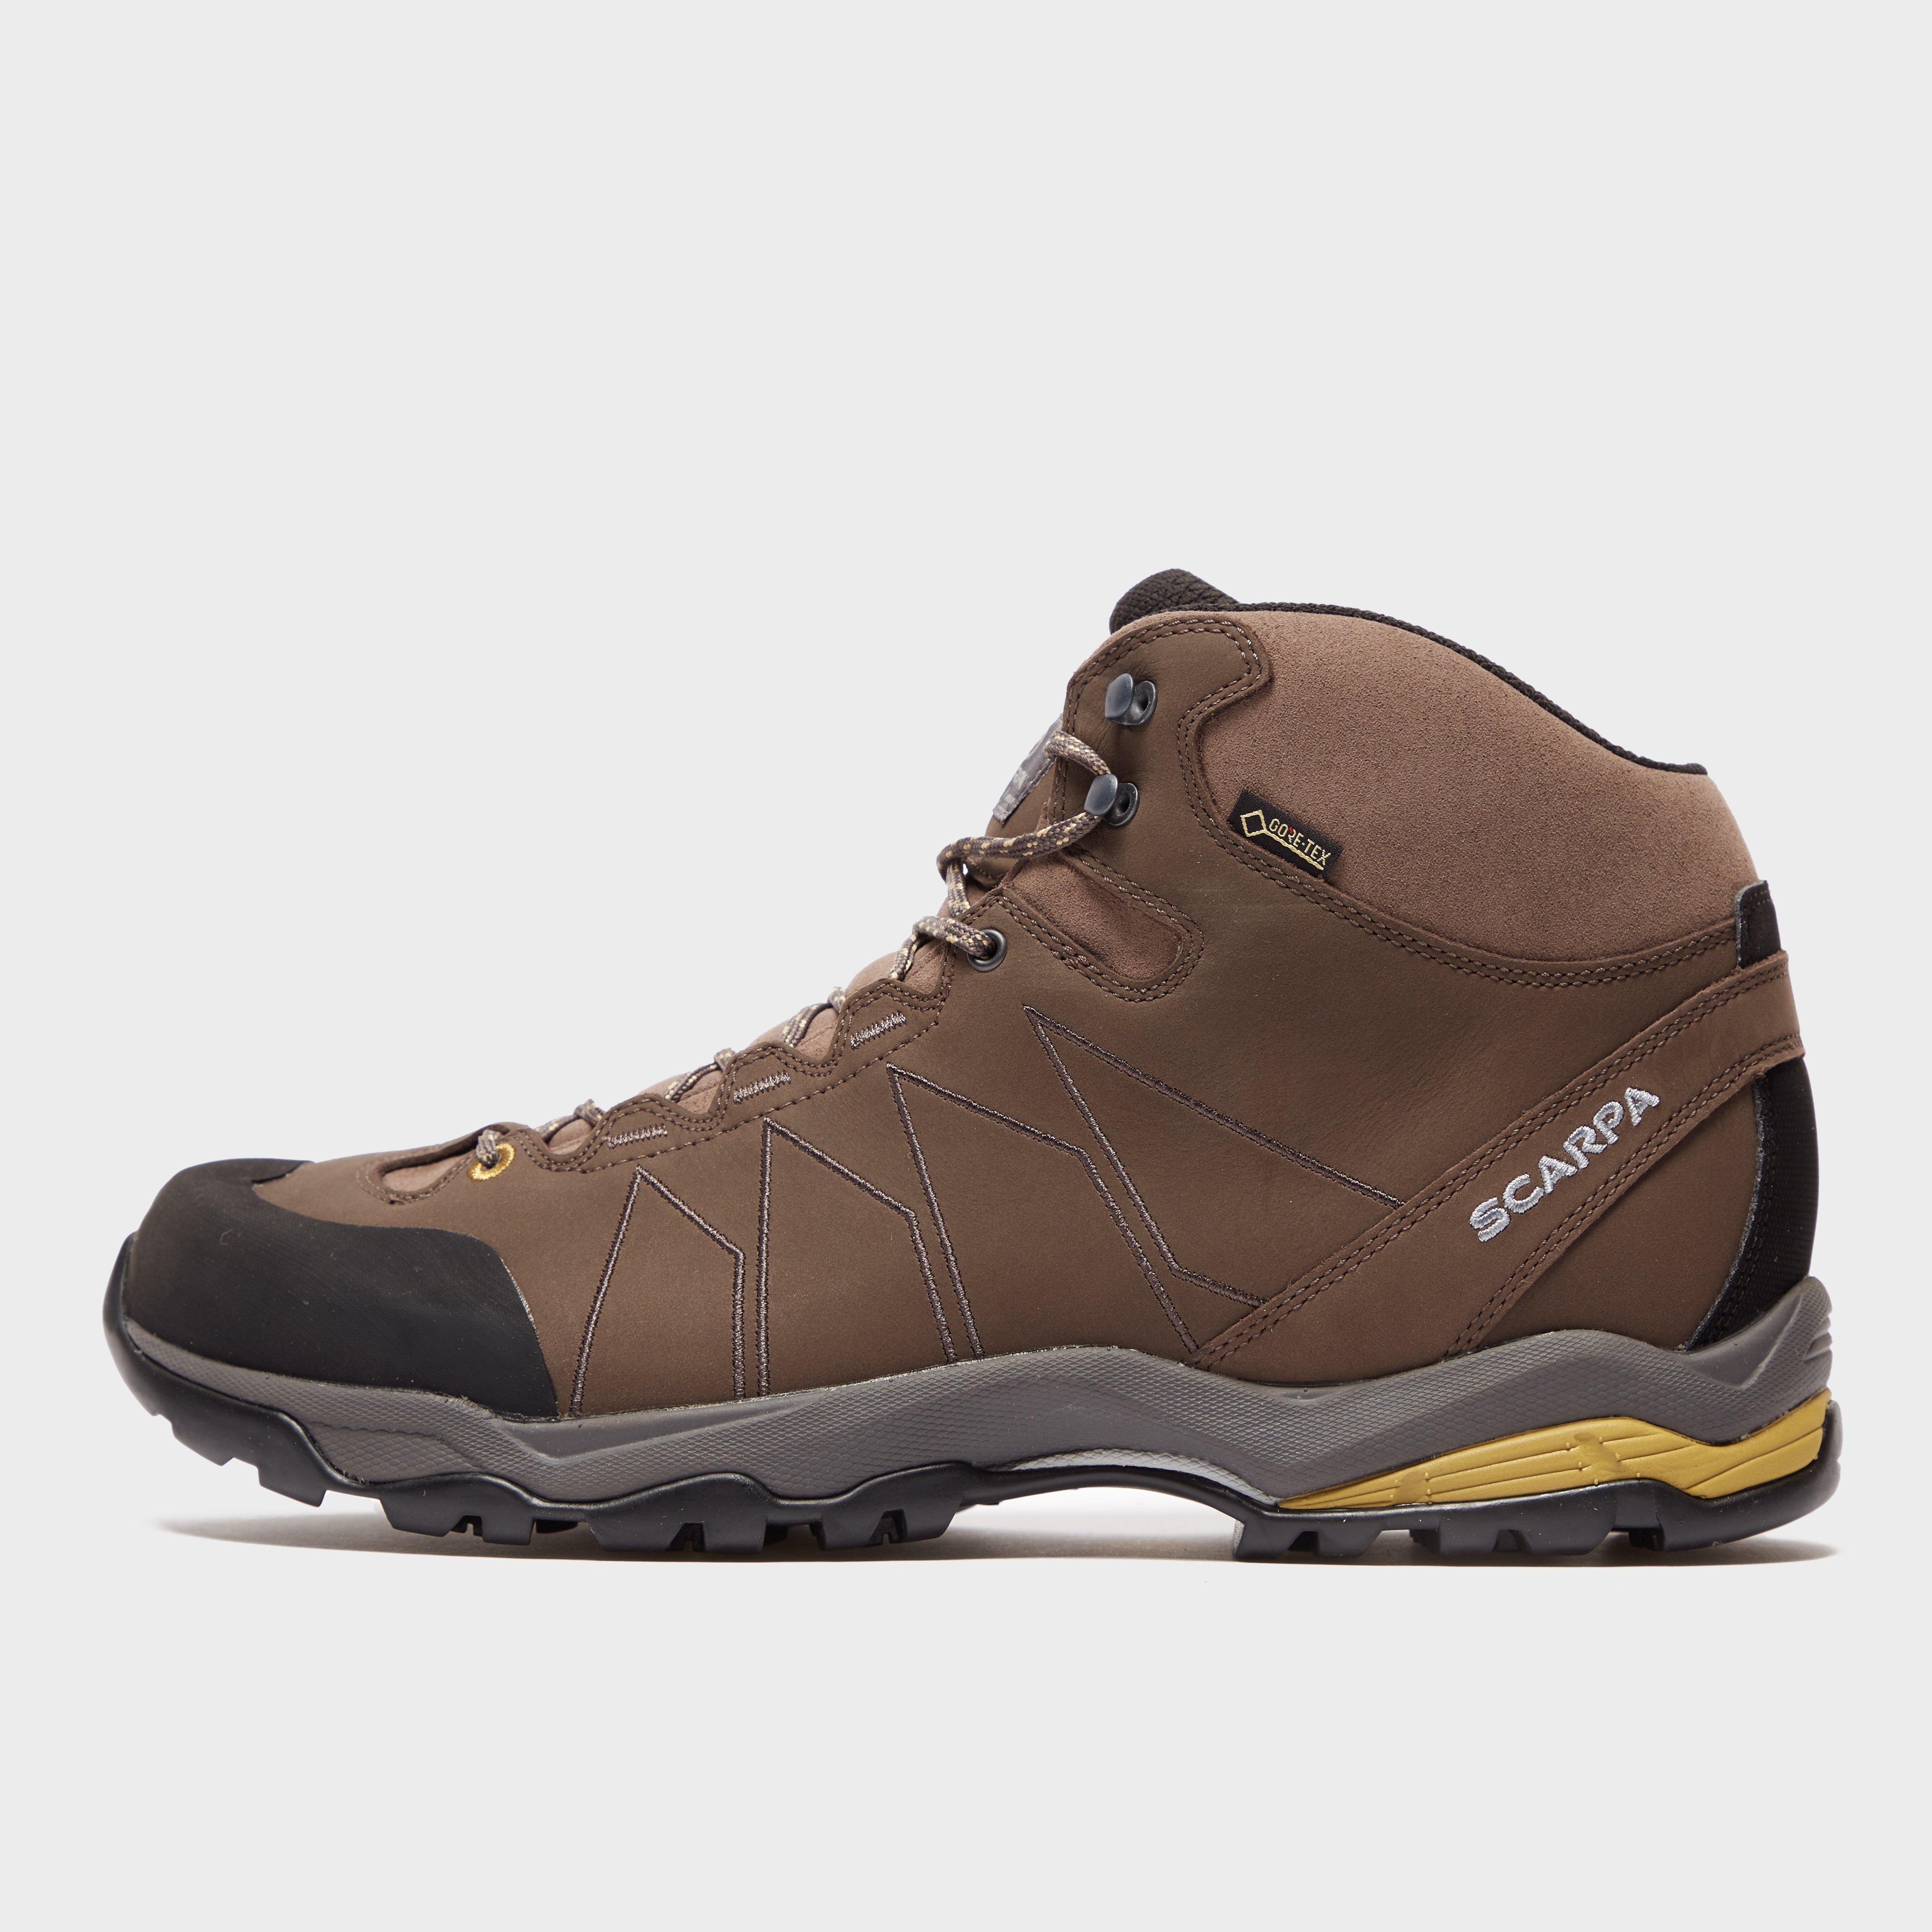 Scarpa Scarpa Mens Moraine Plus Mid GTX Hiking Boot